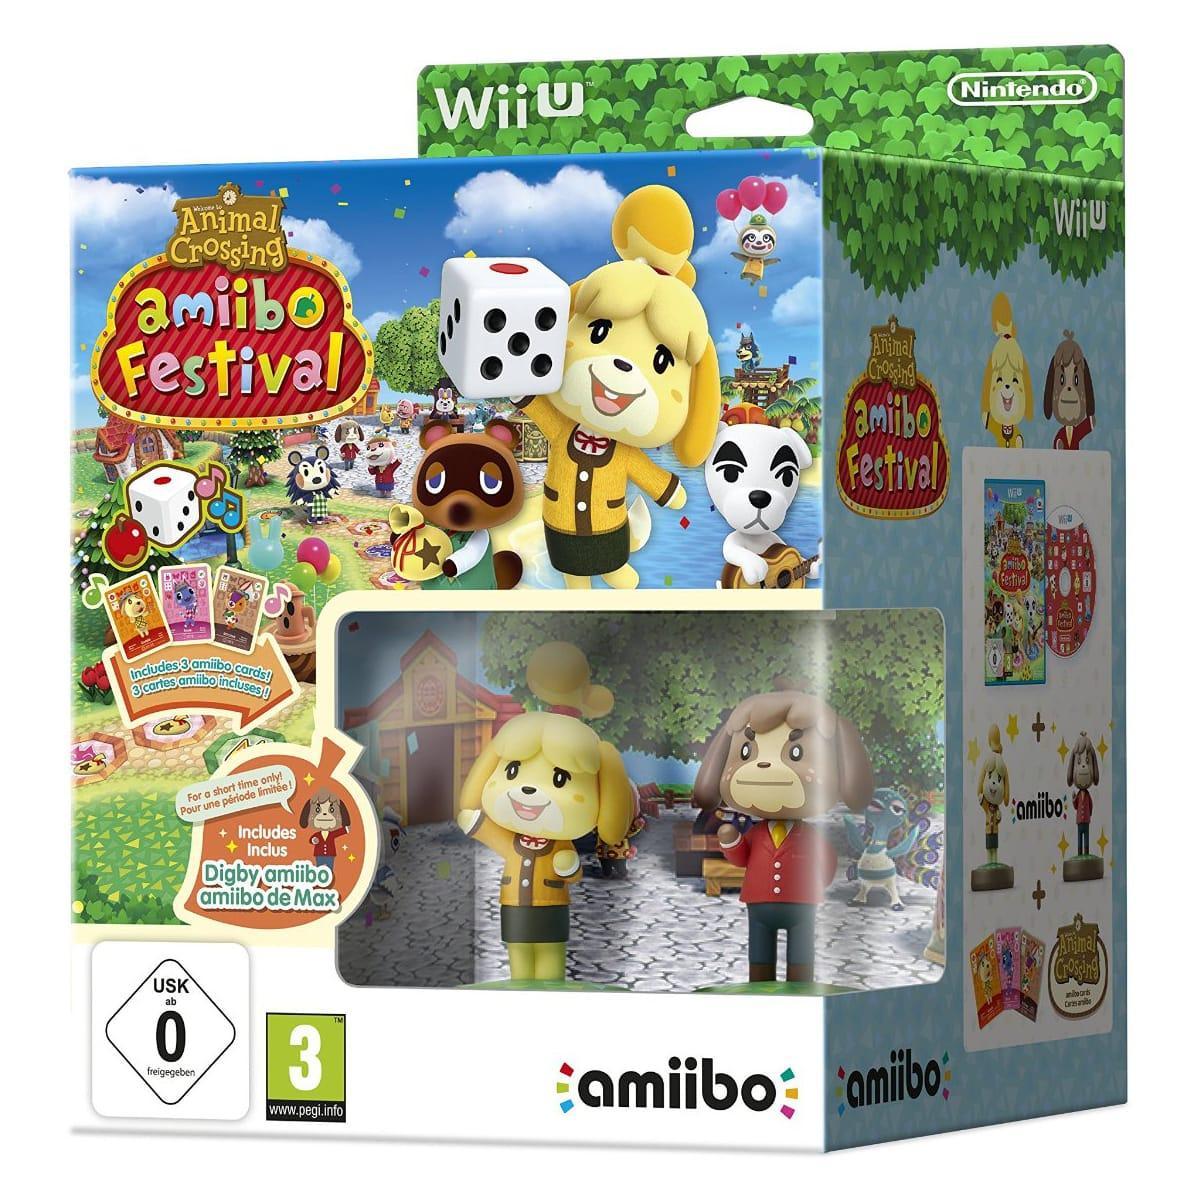 [Premium] Animal Crossing : Amiibo Festival - Edition Limitée (2 Amiibo + 3 cartes)  sur Wii U